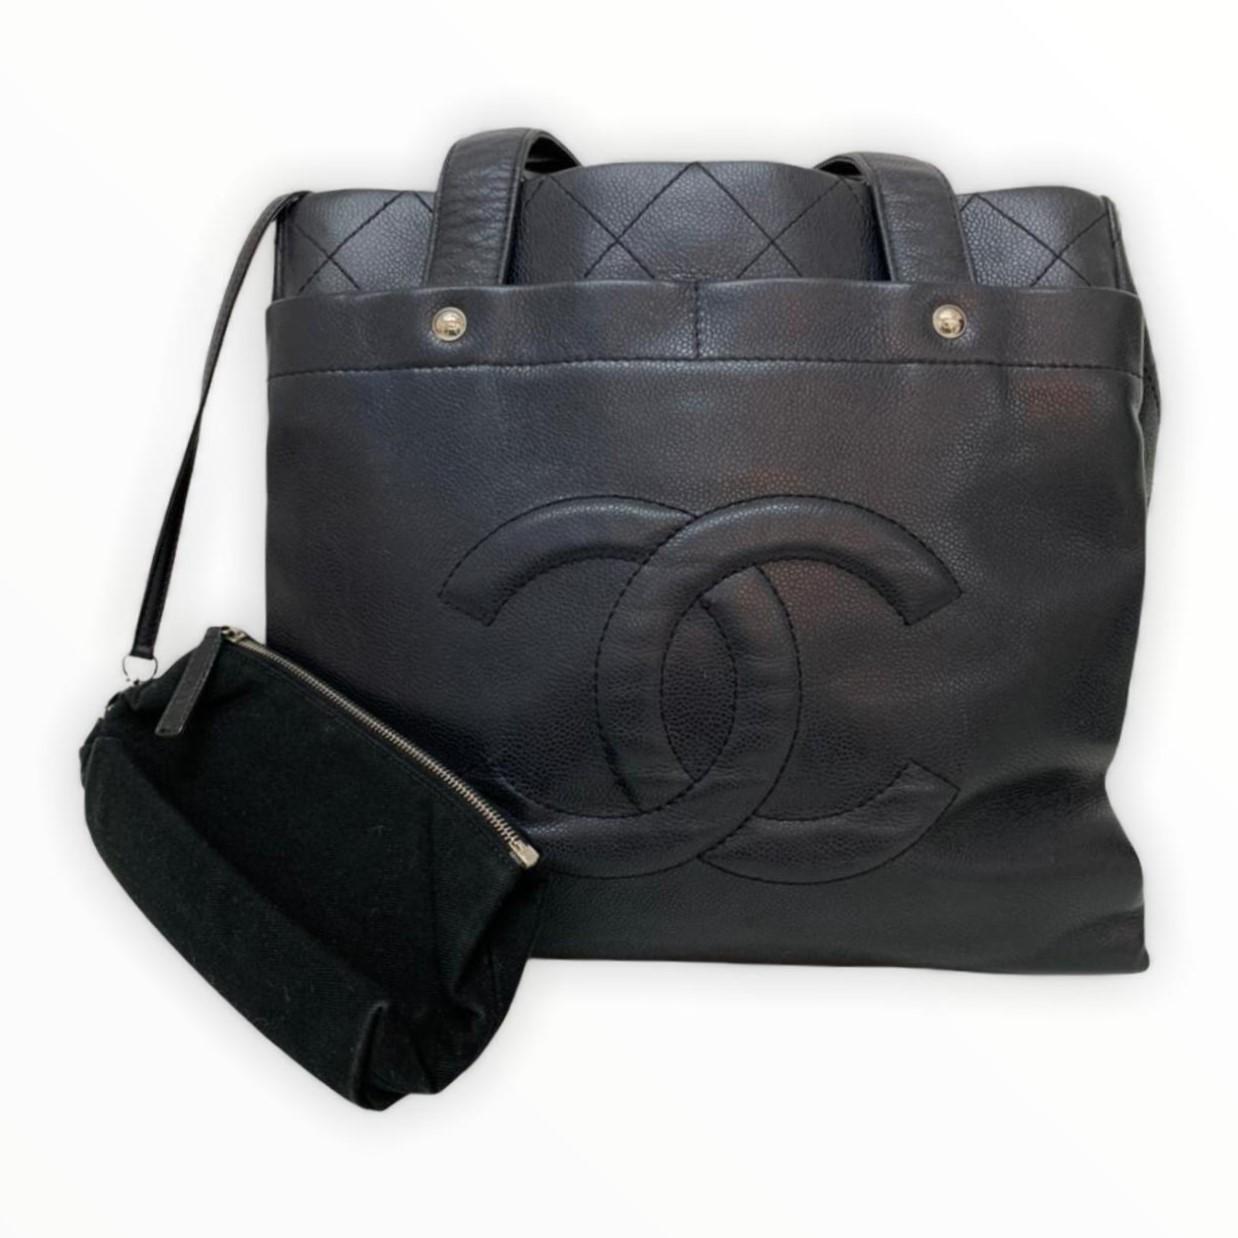 Bolsa Chanel Shoulder Preta